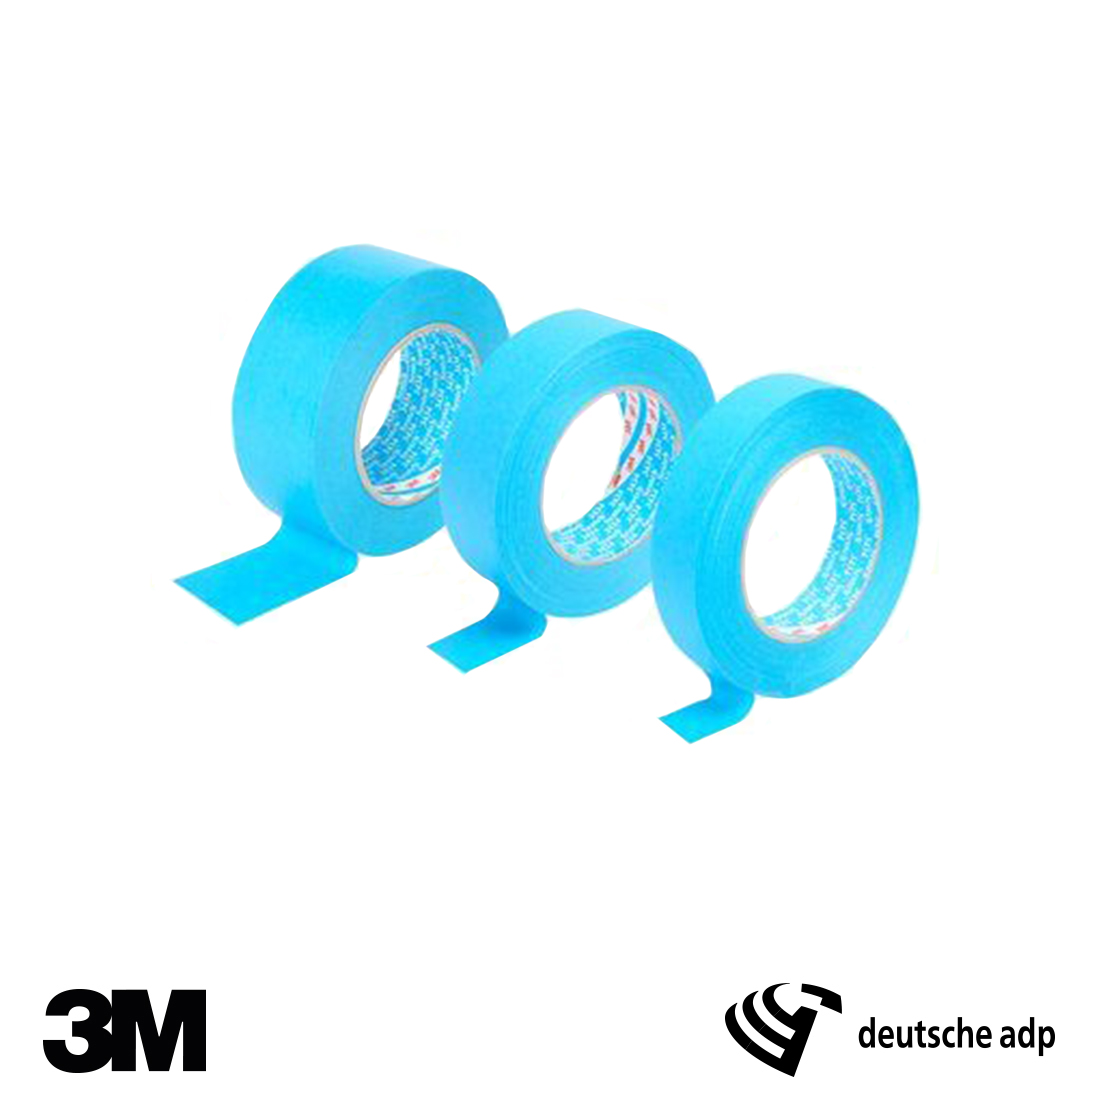 3M Scotch Blaues Band 3434